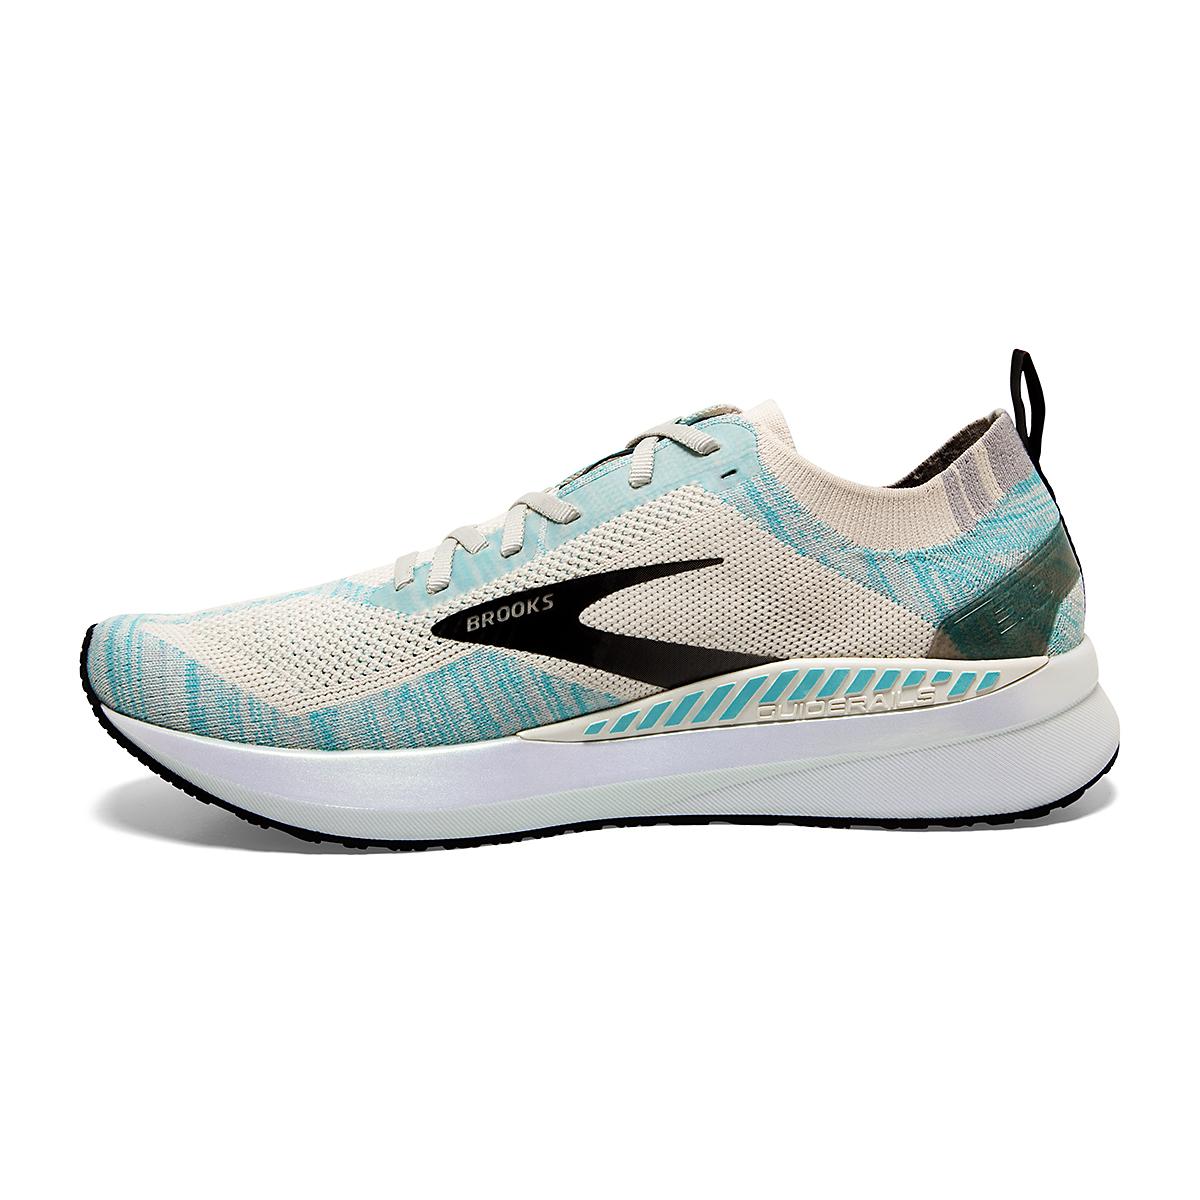 Men's Brooks Bedlam 3 Running Shoe - Color: Jet Stream/Antarctica/Capri - Size: 7 - Width: Regular, Jet Stream/Antarctica/Capri, large, image 2